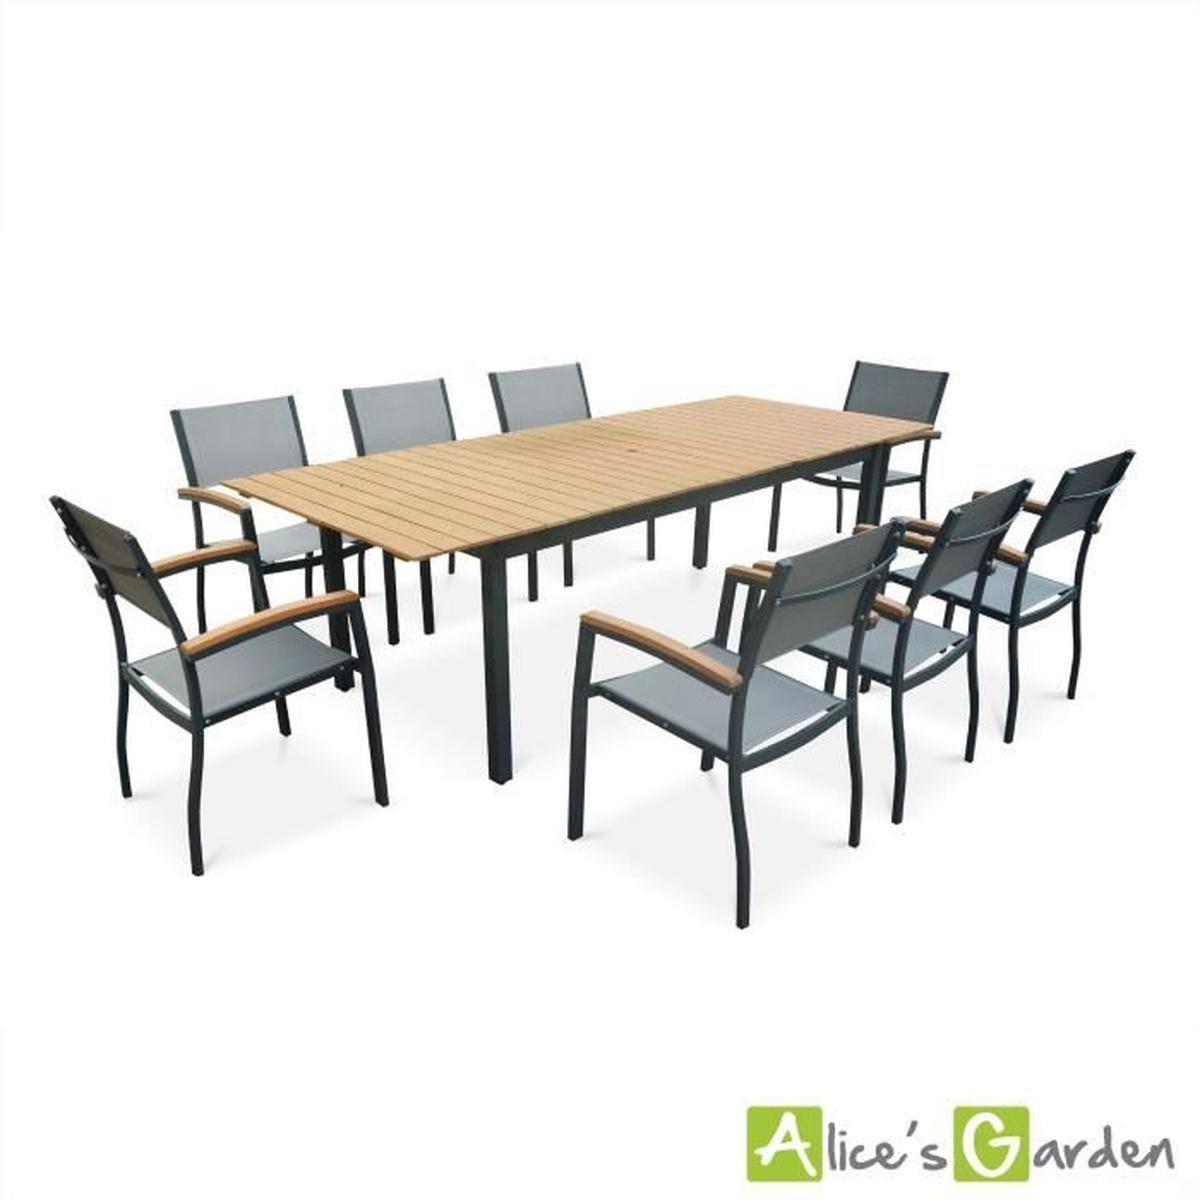 Salon de jardin en bois et aluminium Sevilla grande table